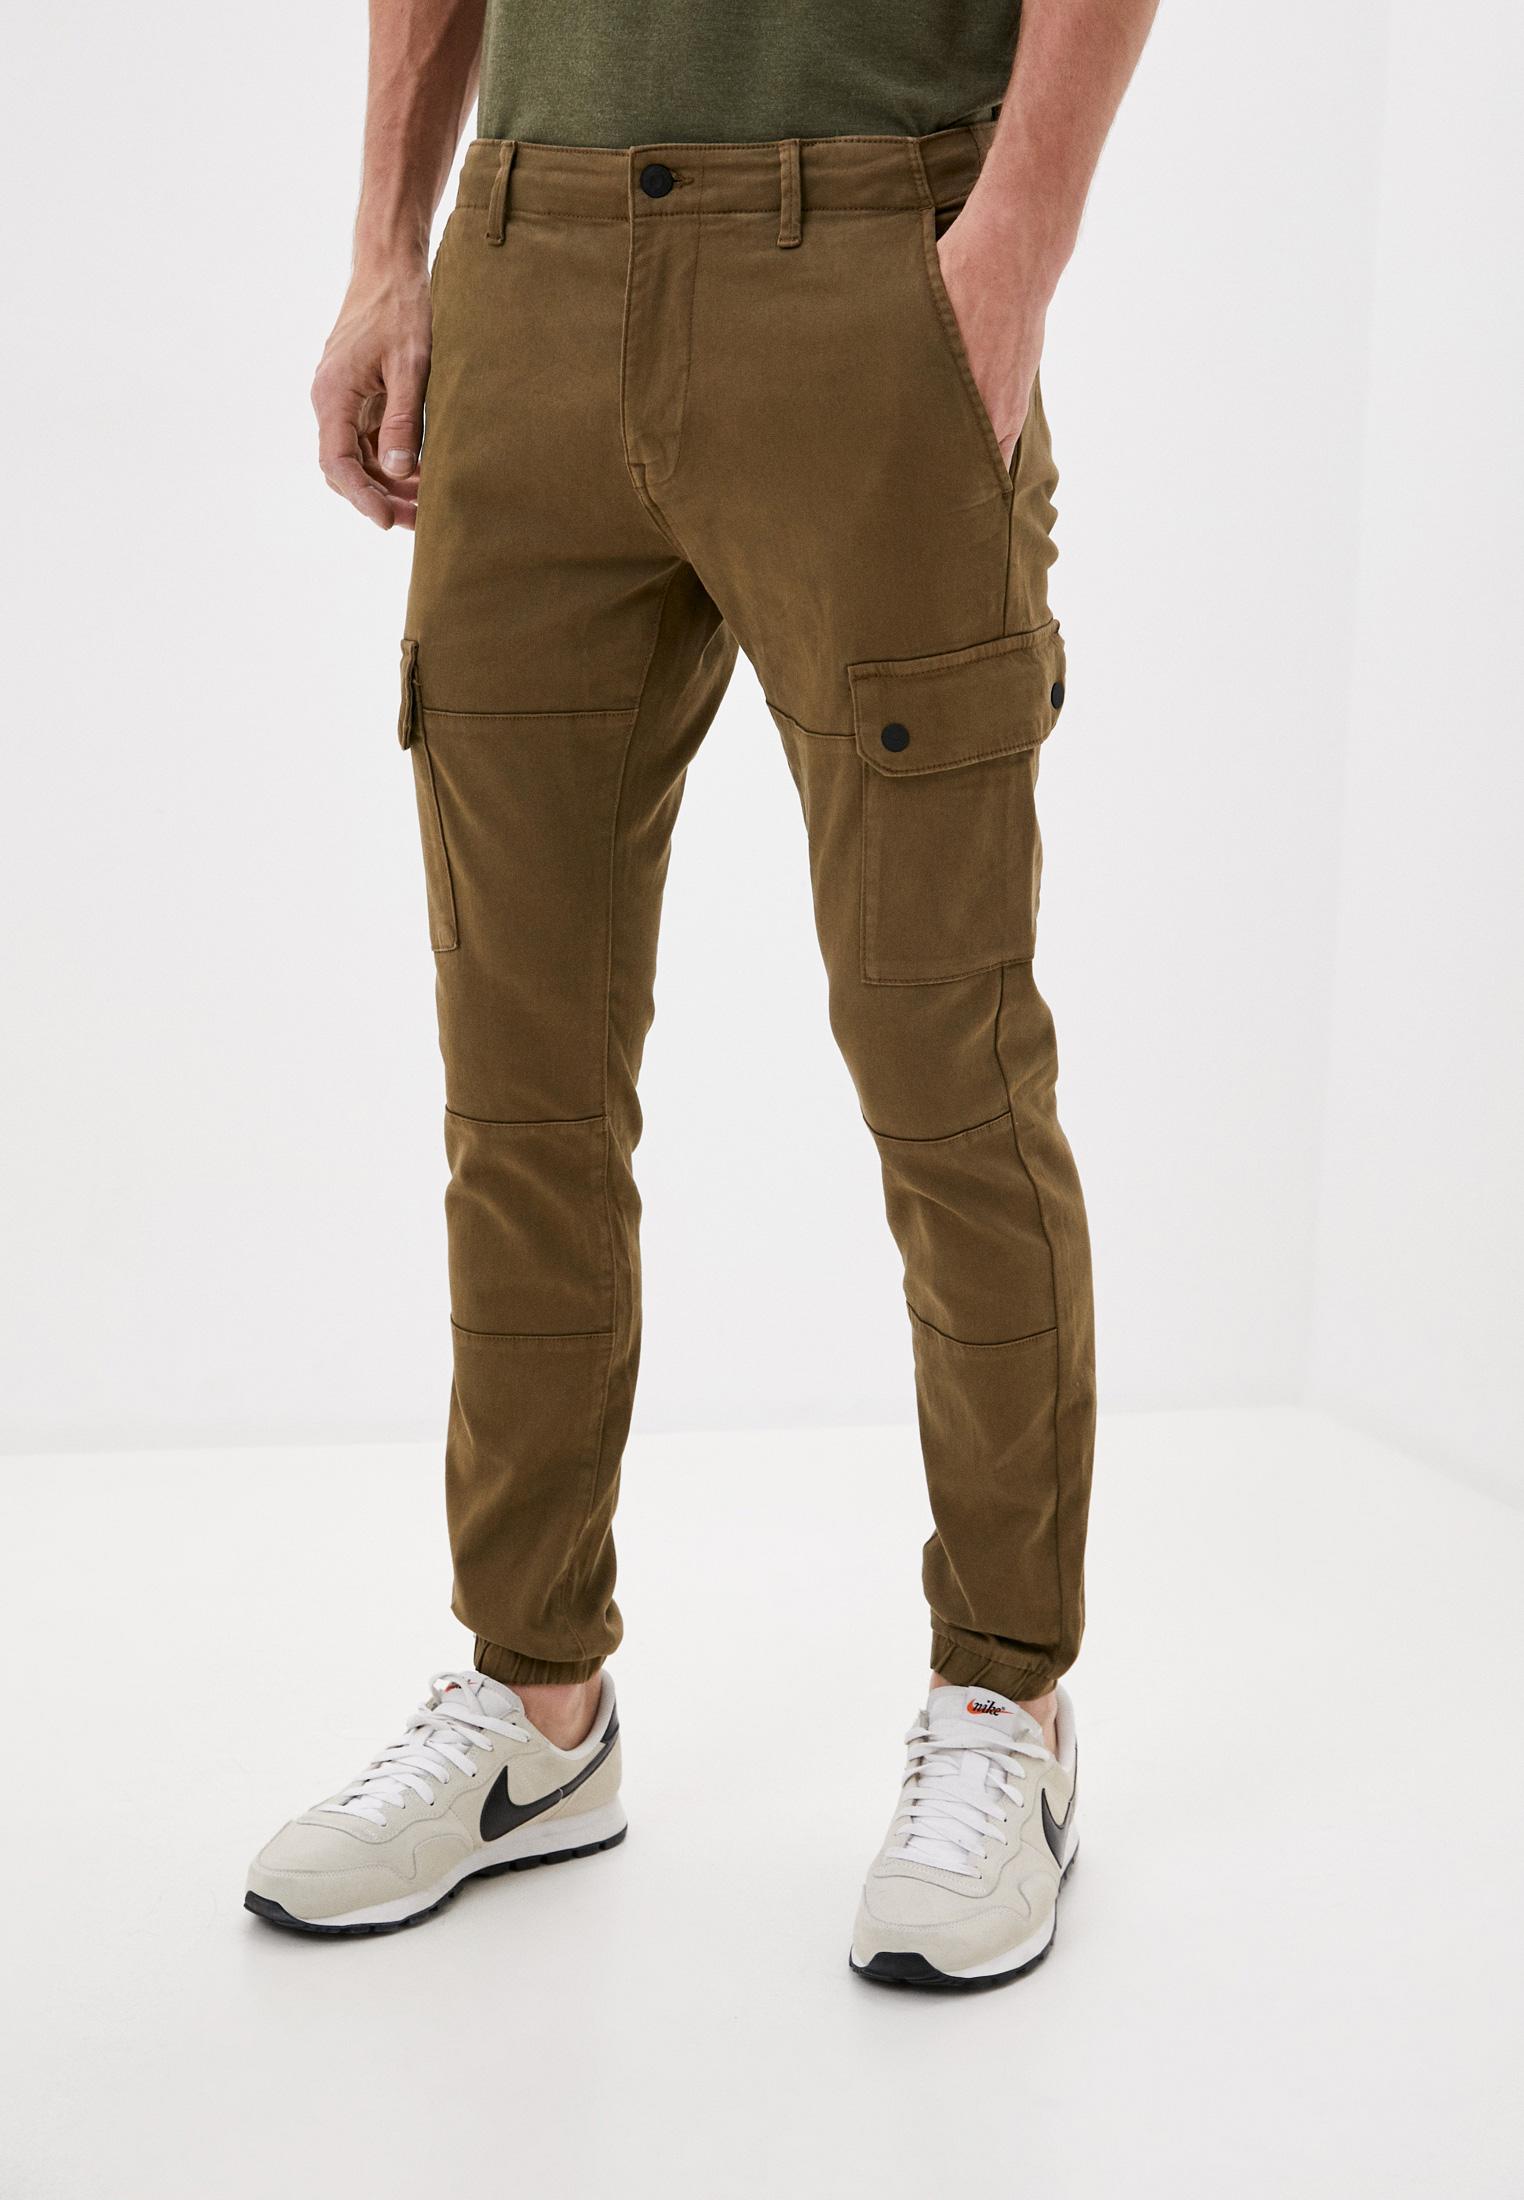 Мужские зауженные брюки Celio (Селио) Брюки Celio